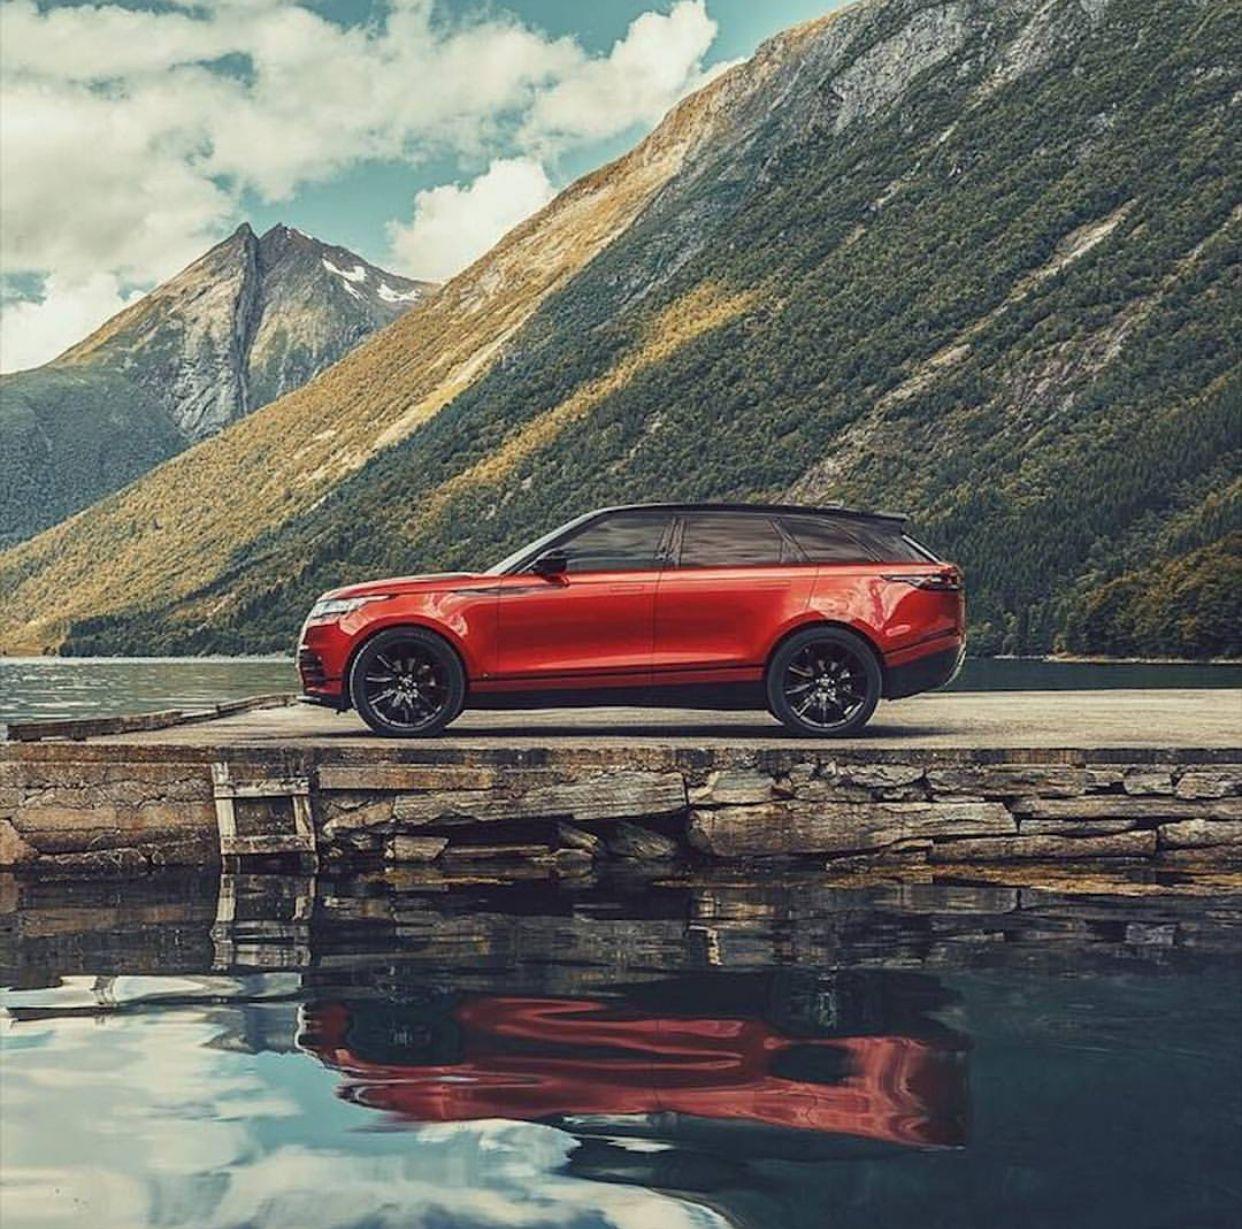 Land Rover Car, Audi Allroad, Suv 4x4